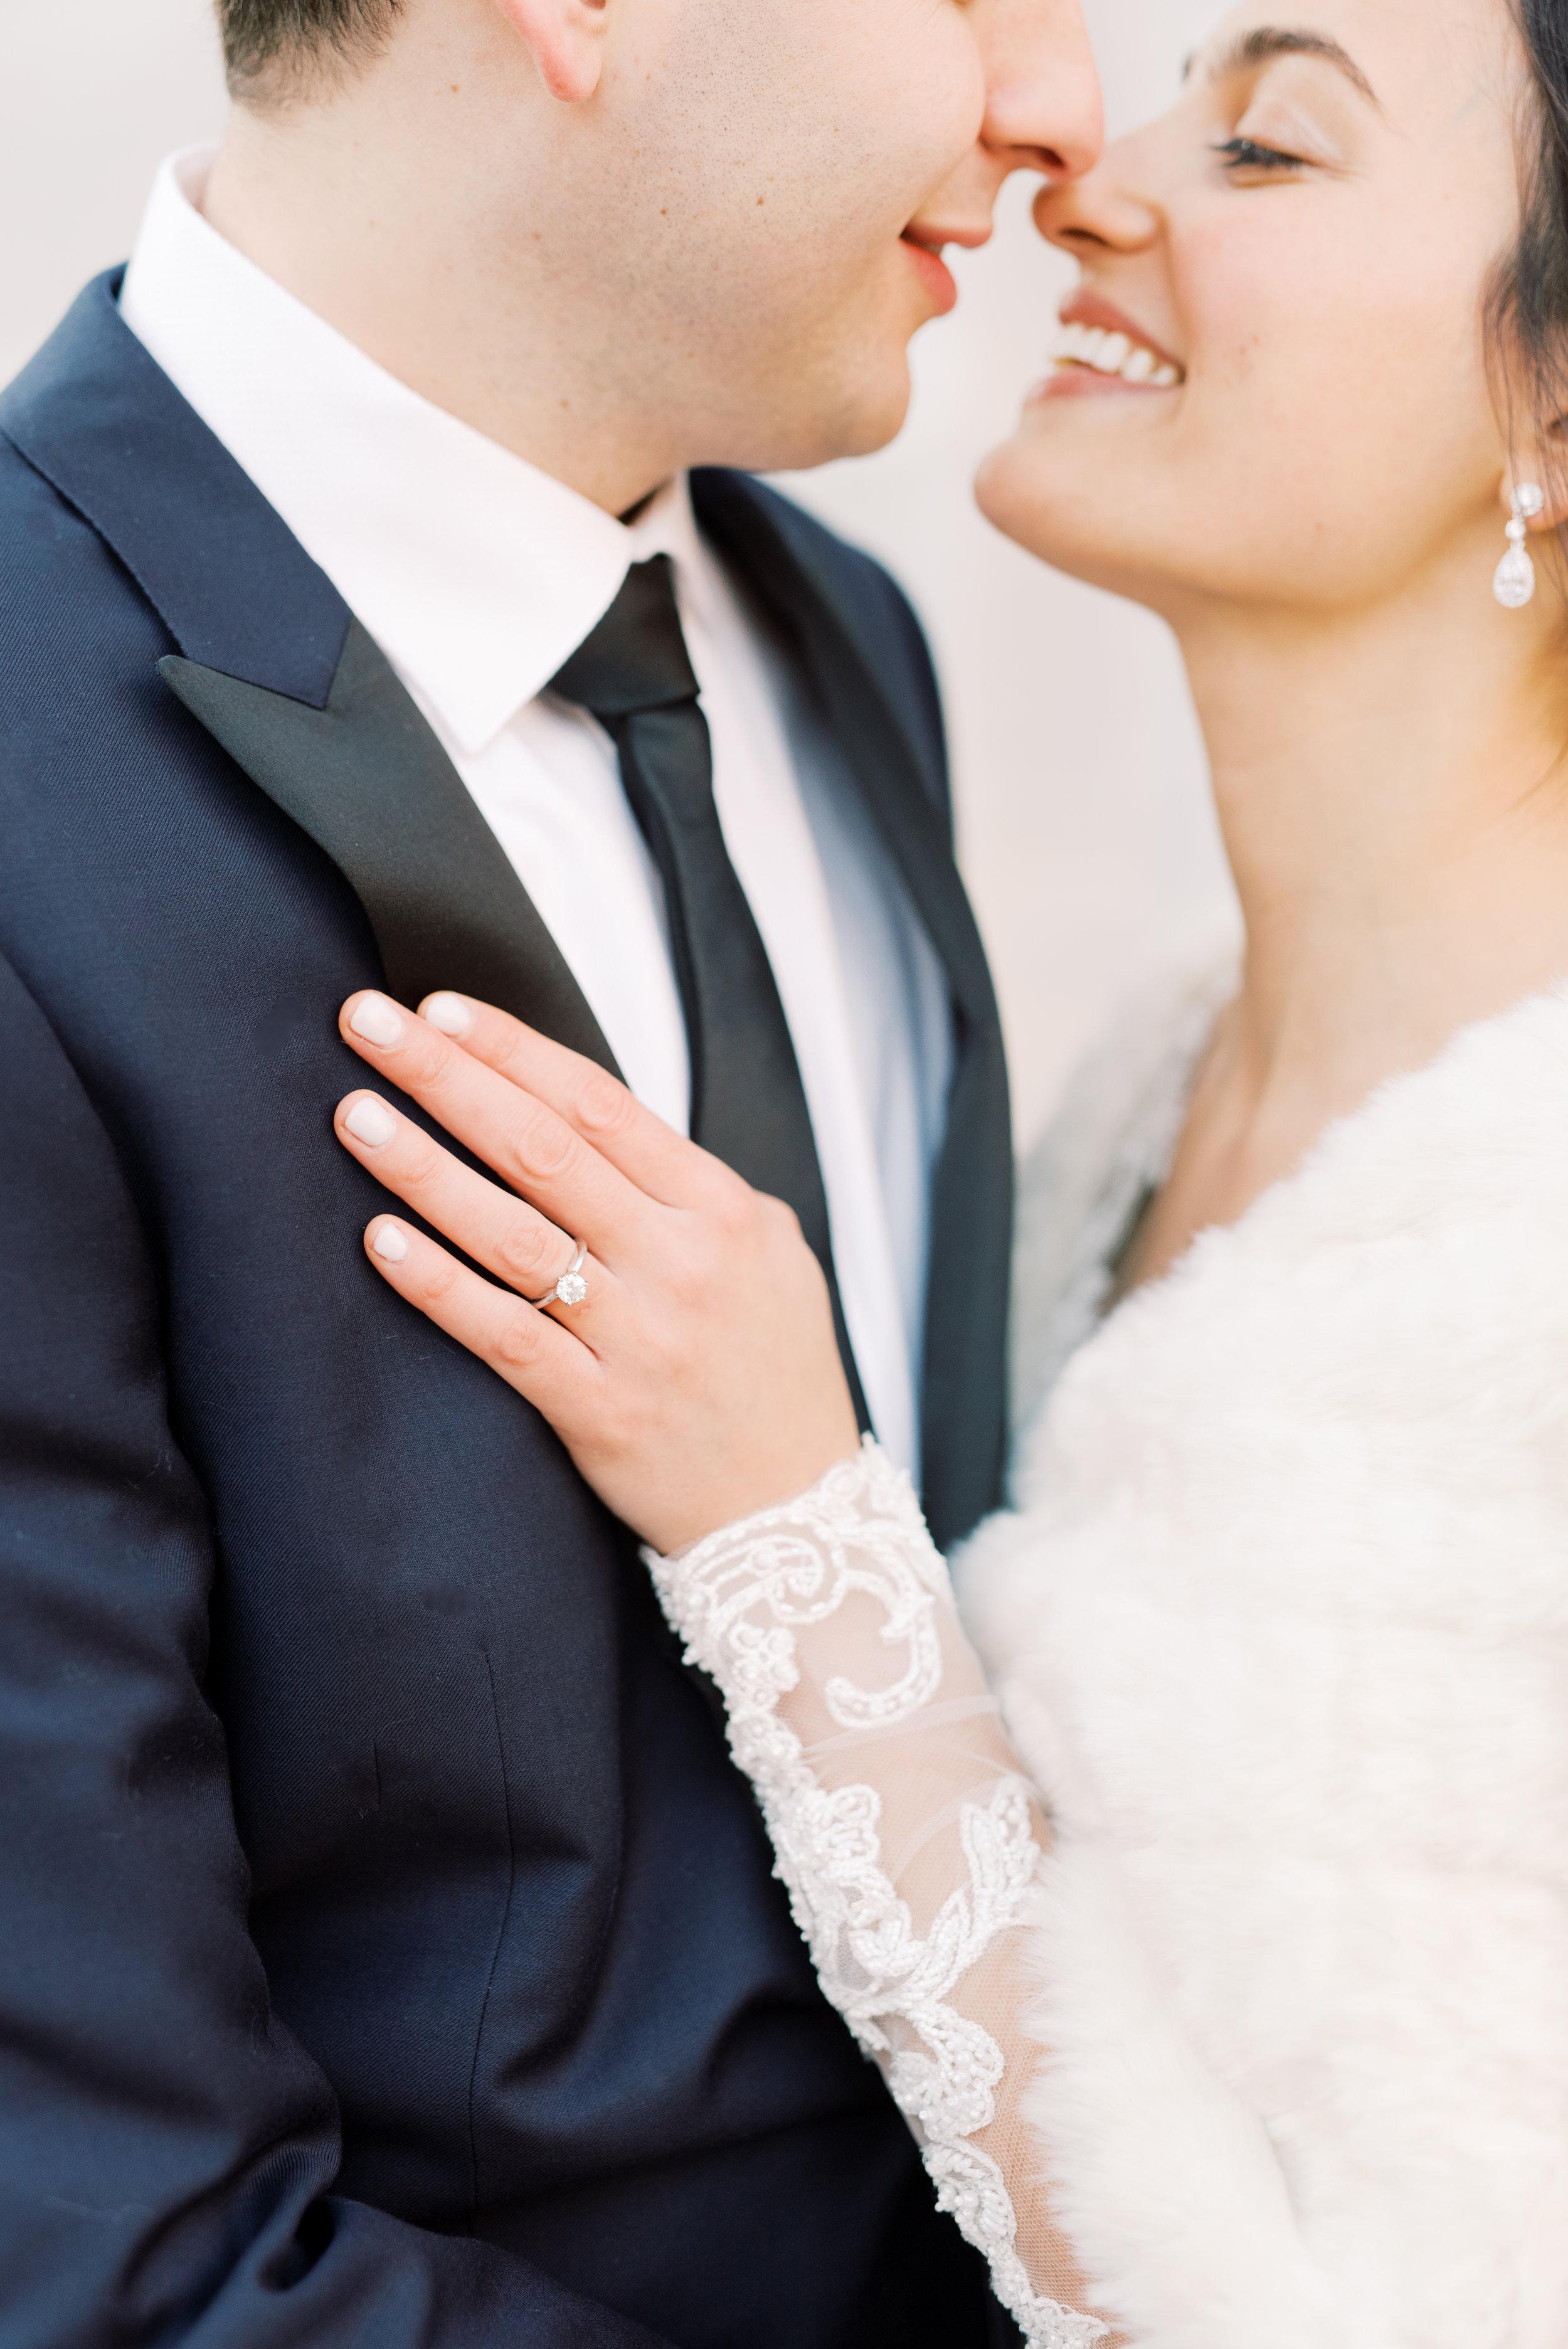 haley-richter-photography-classic-winter-union-trust-philadelphia-wedding-065.jpg